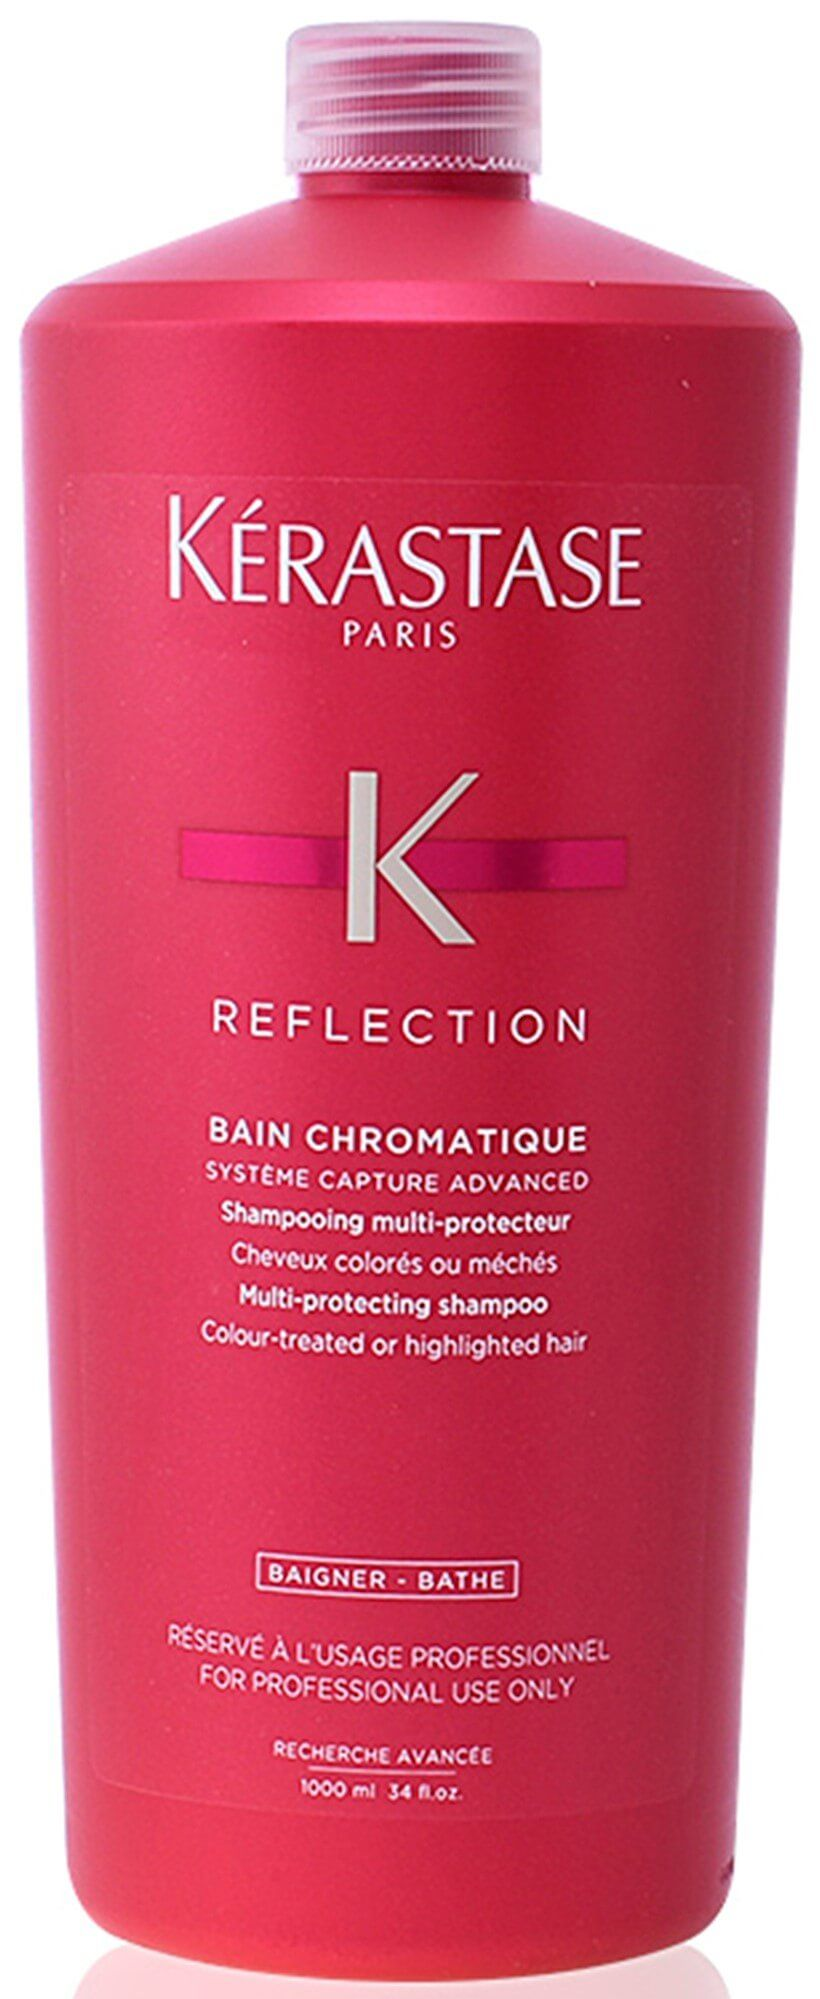 Shampoo Kérastase Réflection Bain Chromatique Riche - 1Litro